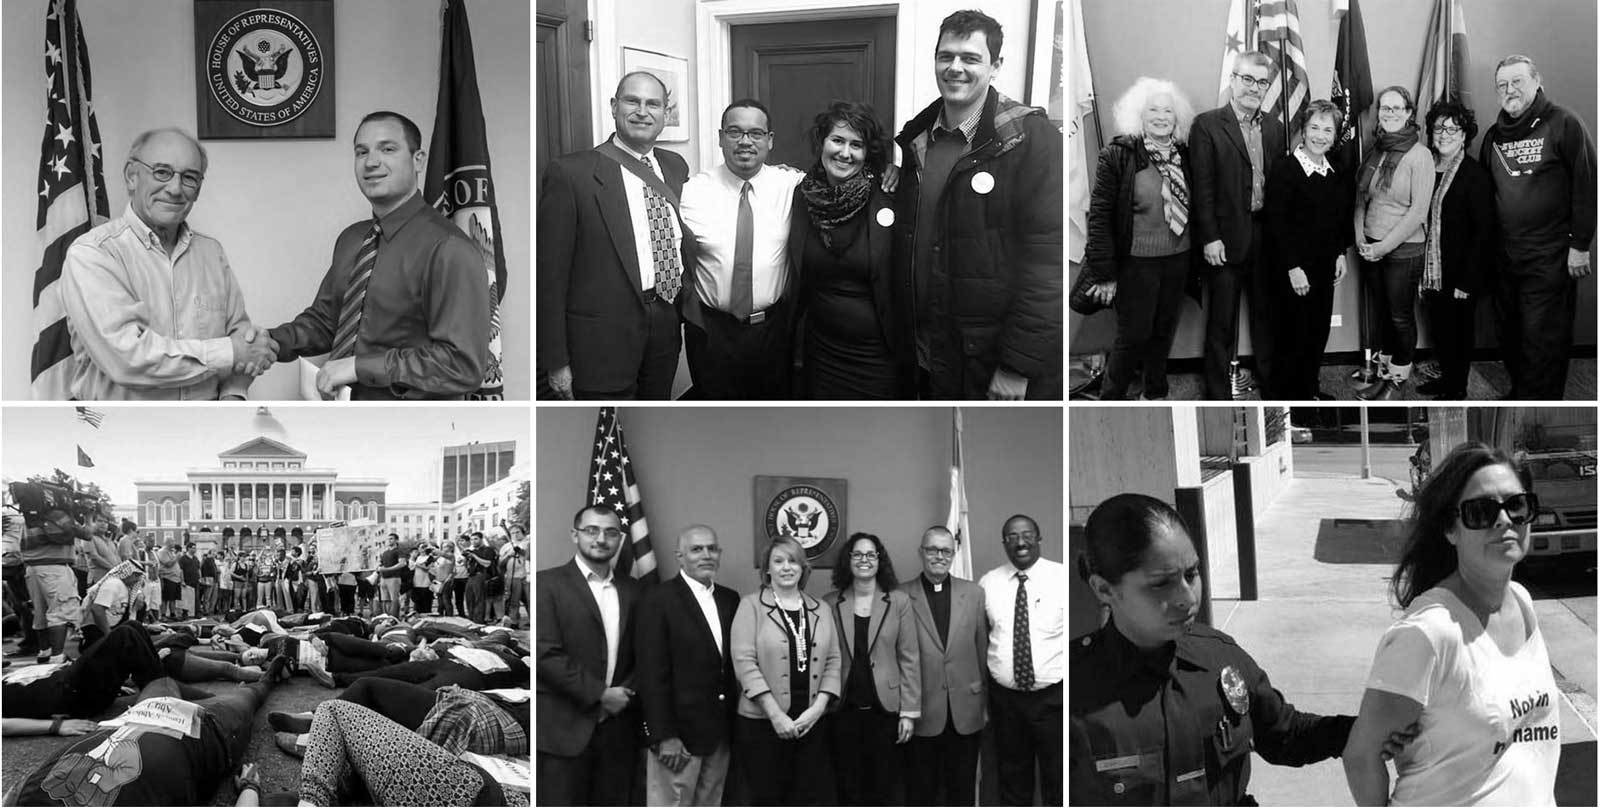 Group-shot-with-white-border-legislative